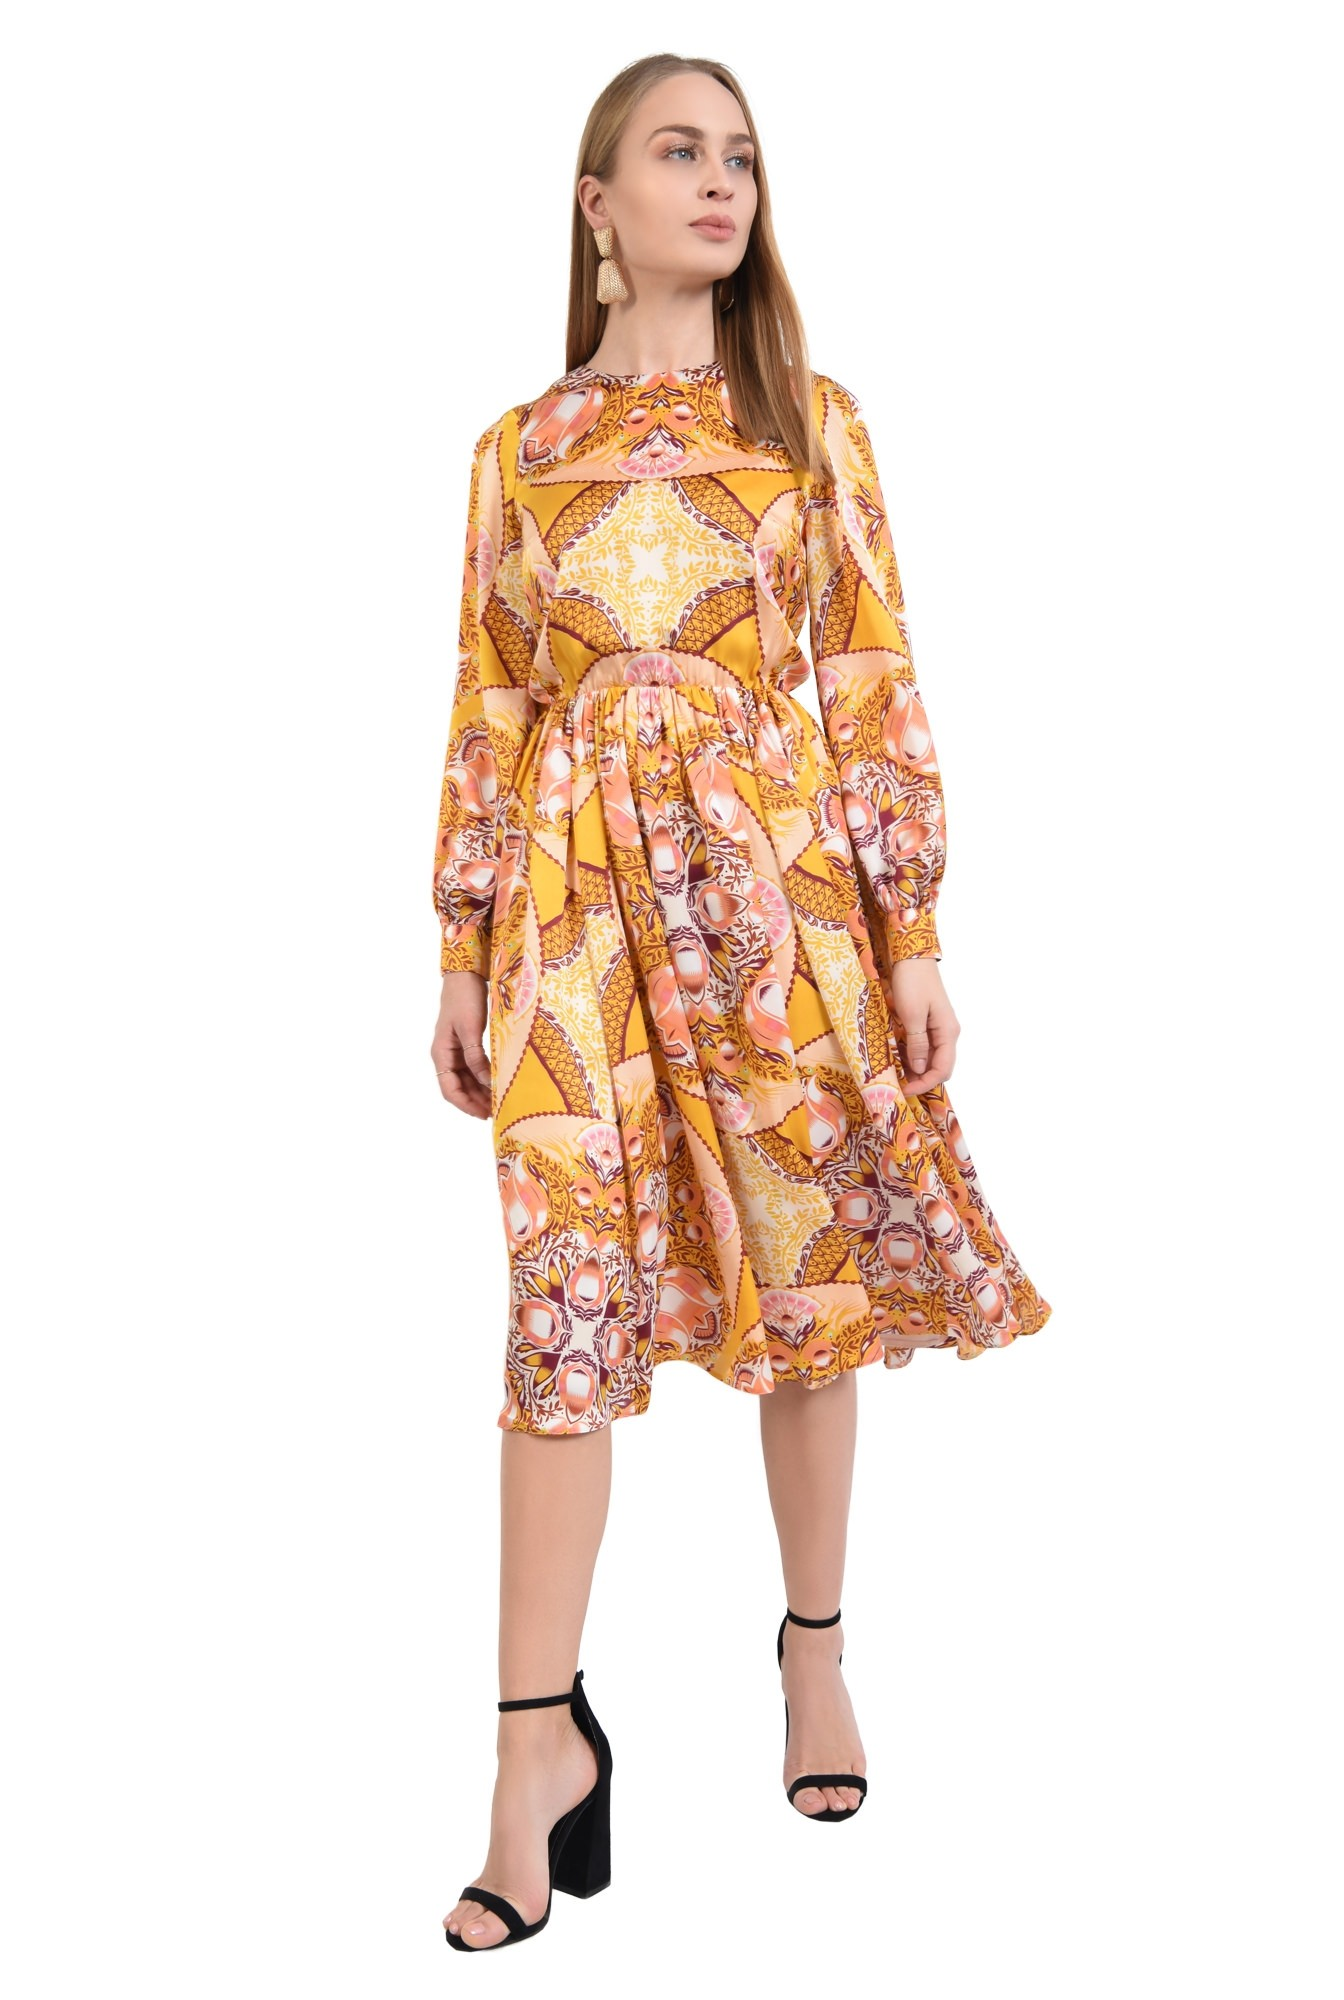 3 - 360 - rochie imprimata, midi, croi pe bie, galben mustar, imprimeu abstract